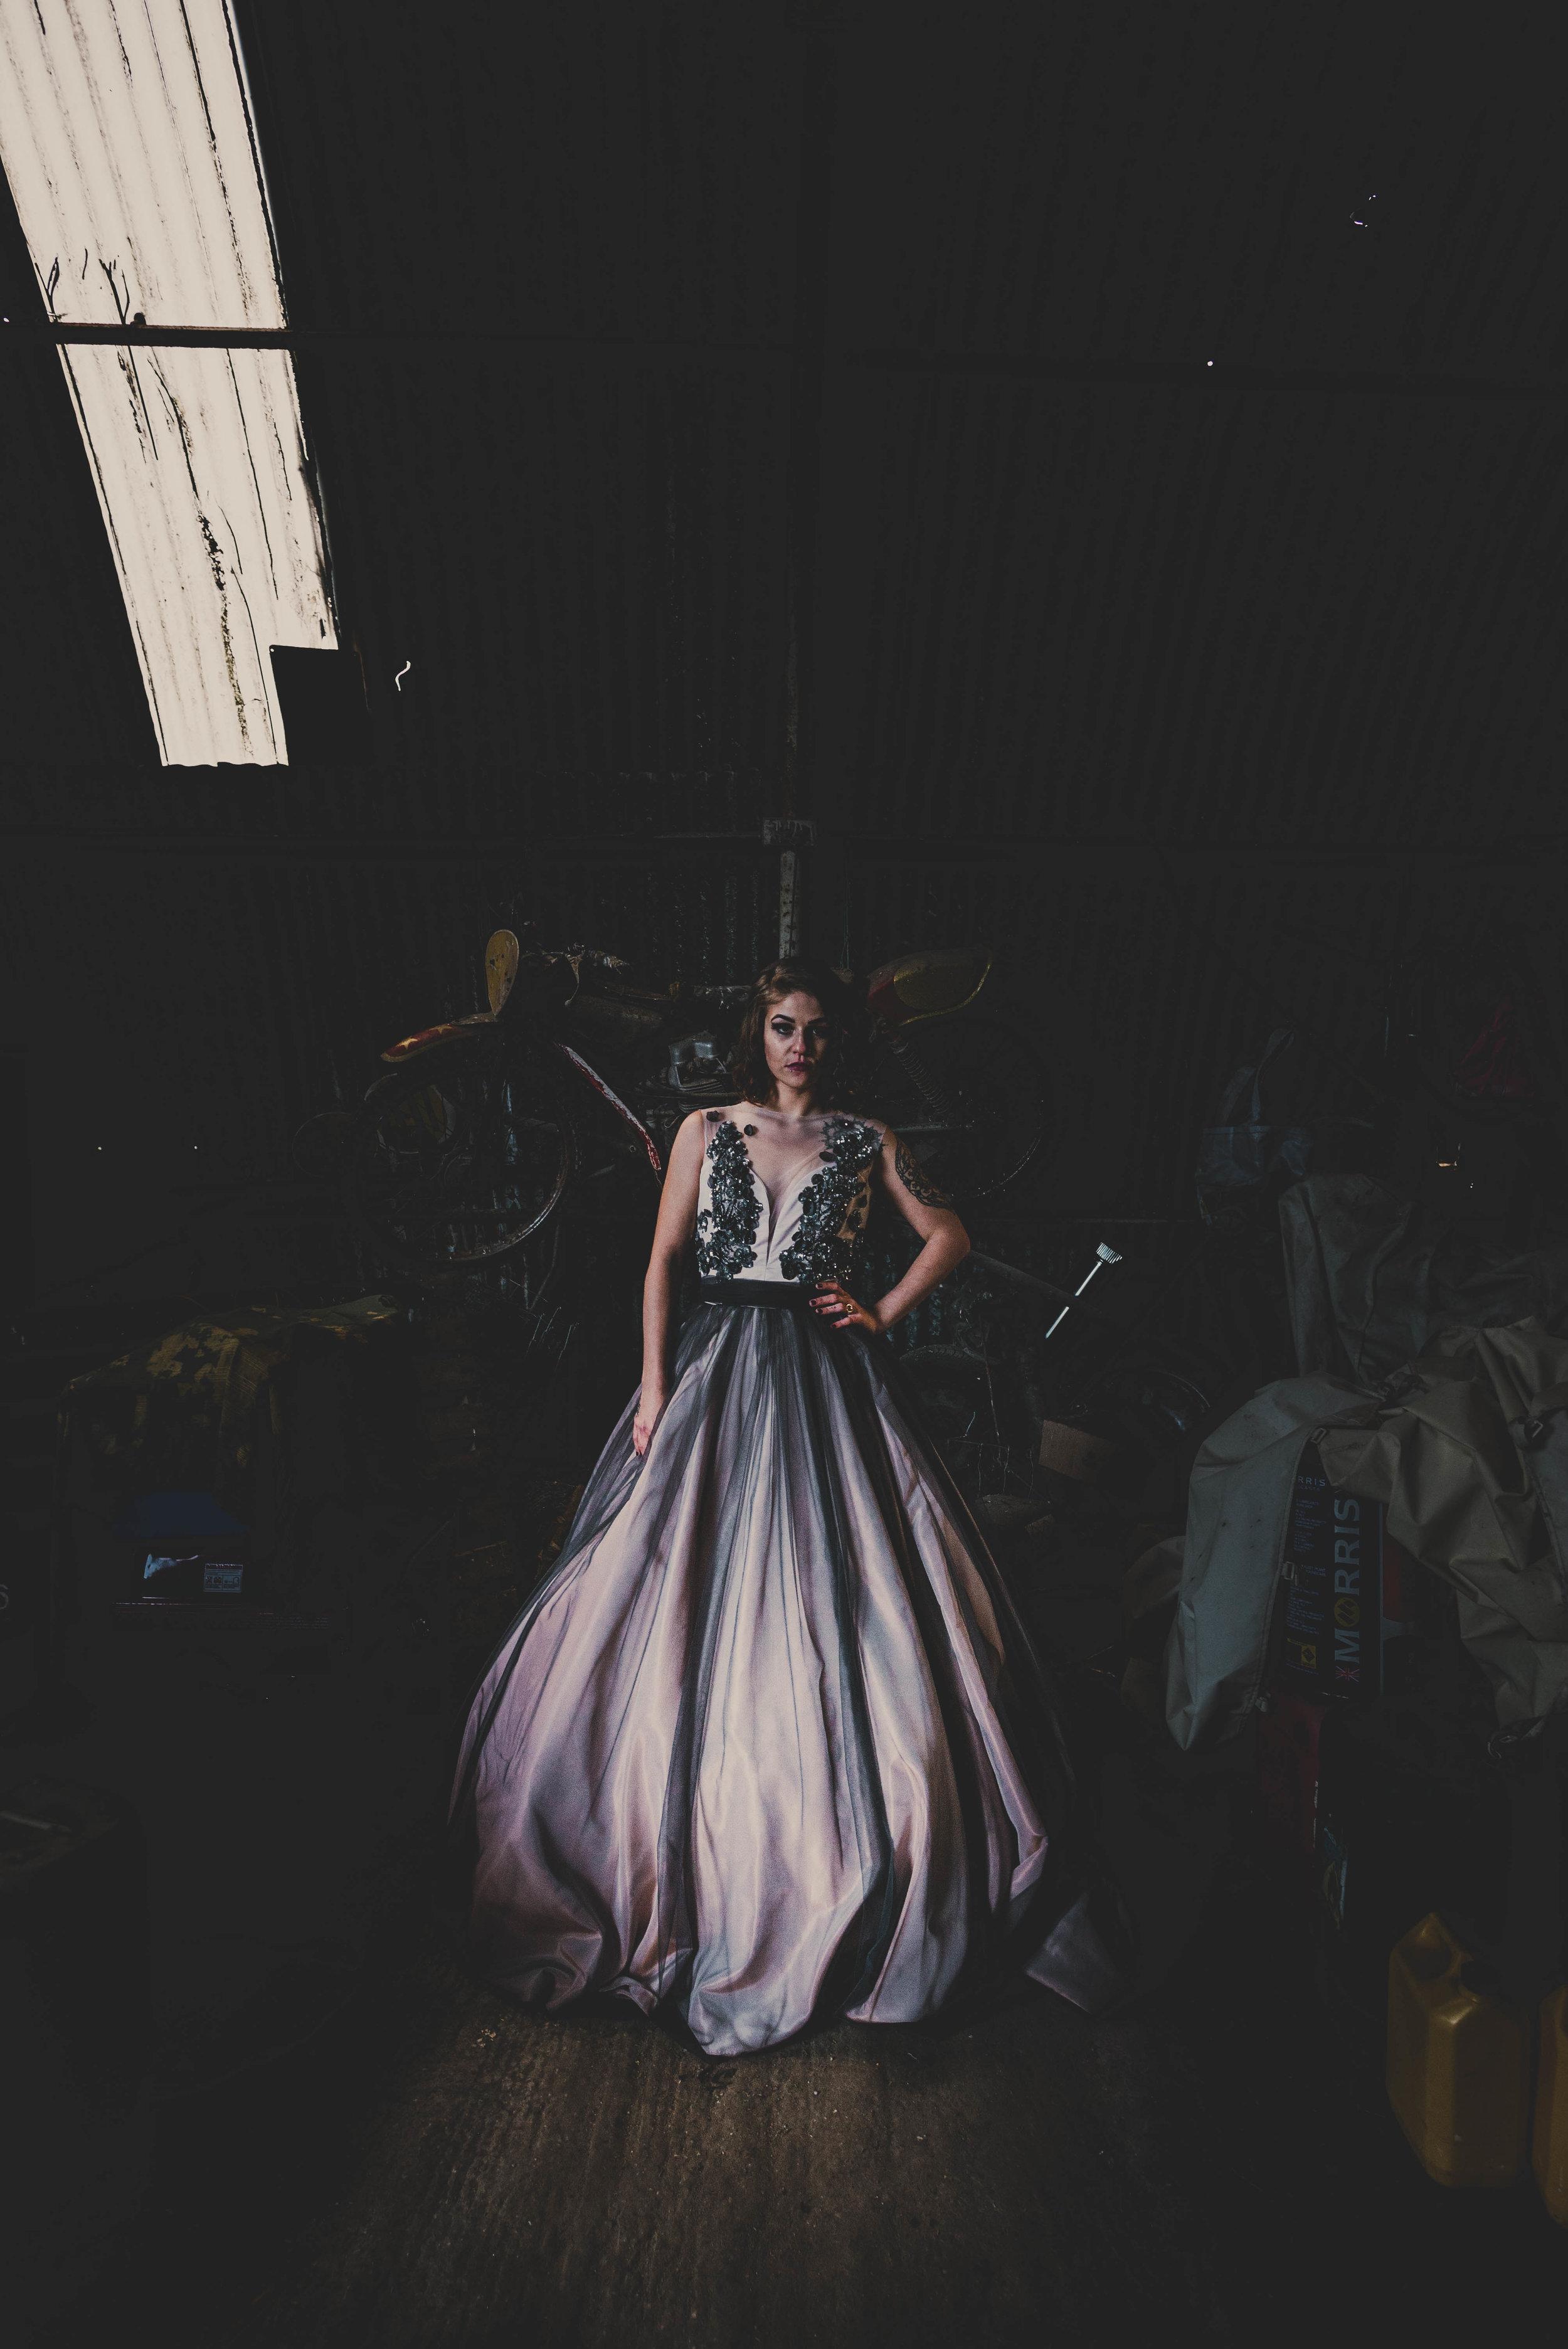 alternative-wedding-photography-cheshire (3).jpg